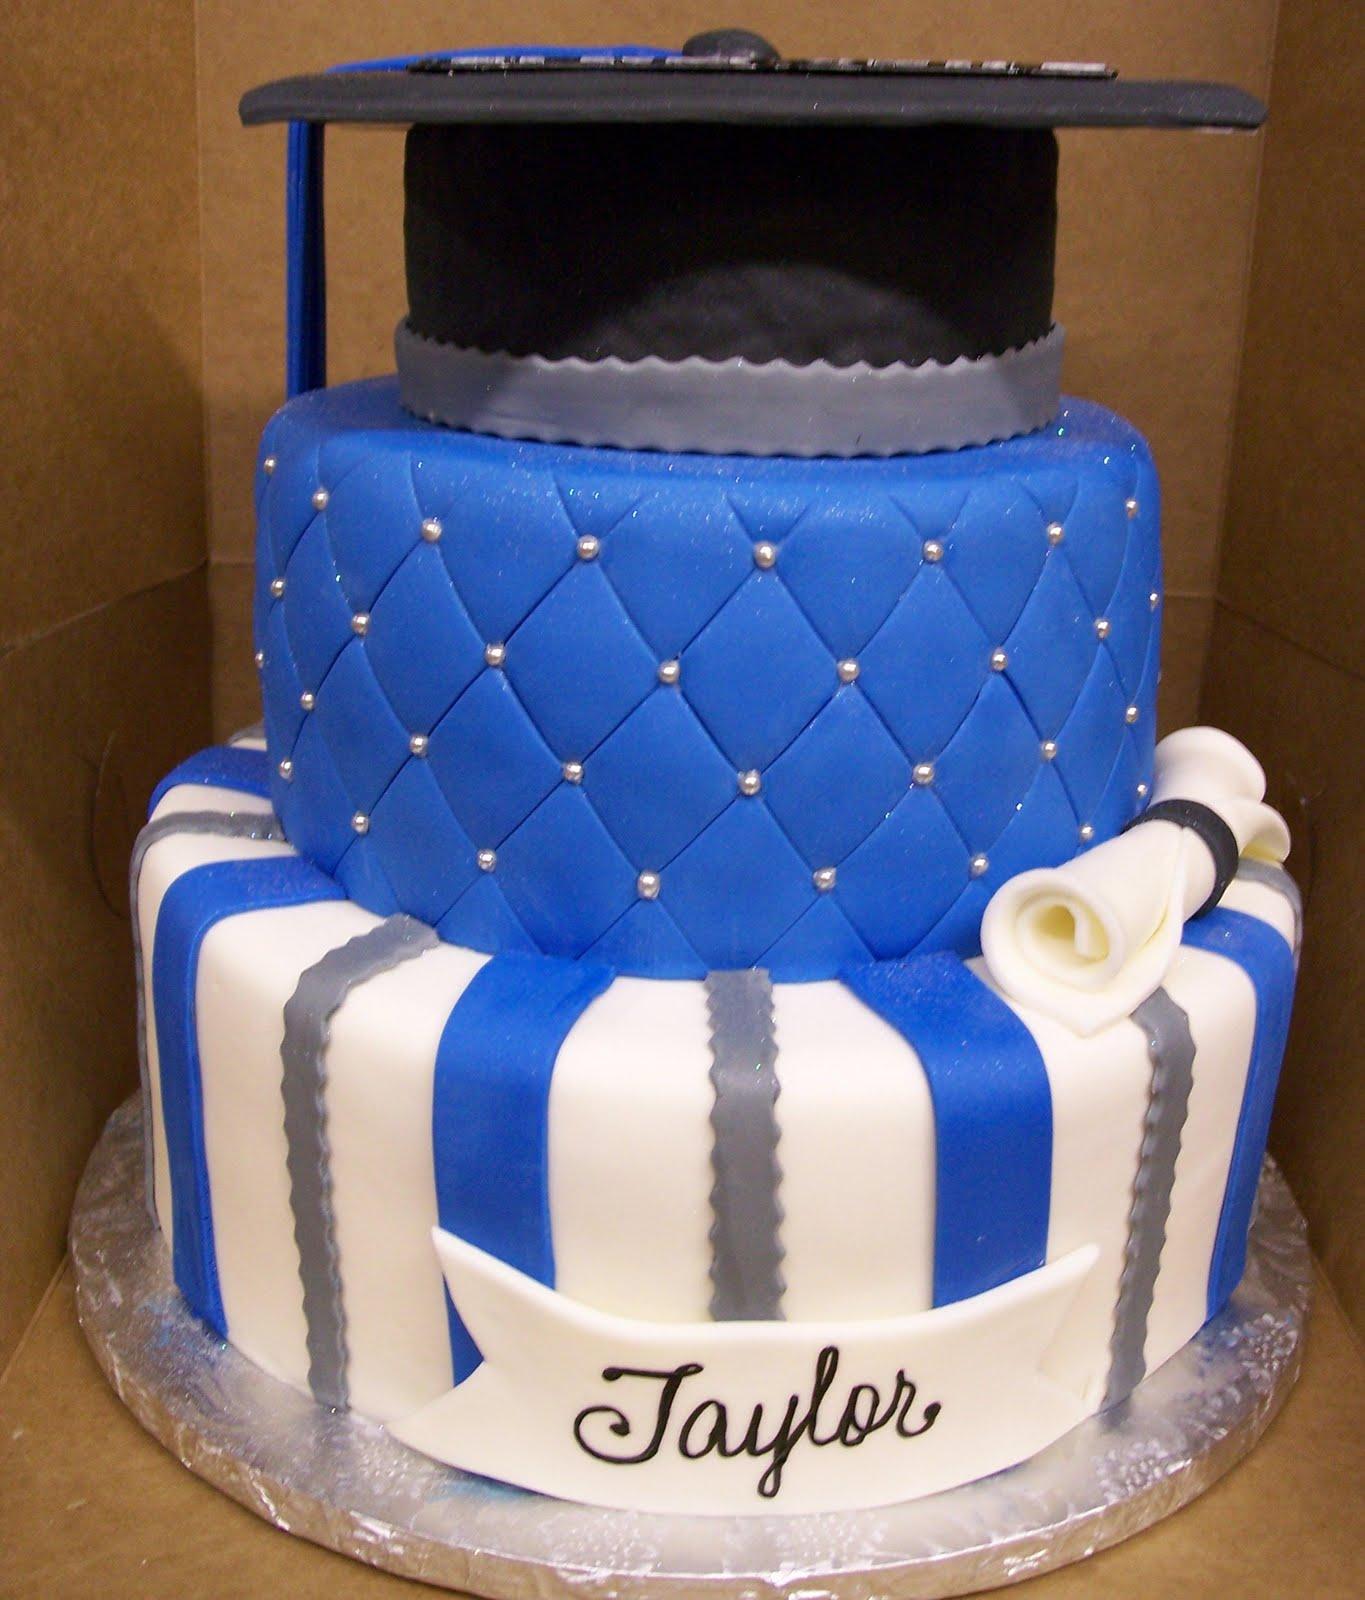 Cake Images Graduation : MyMoniCakes: Blue & Silver Graduation Hat cake